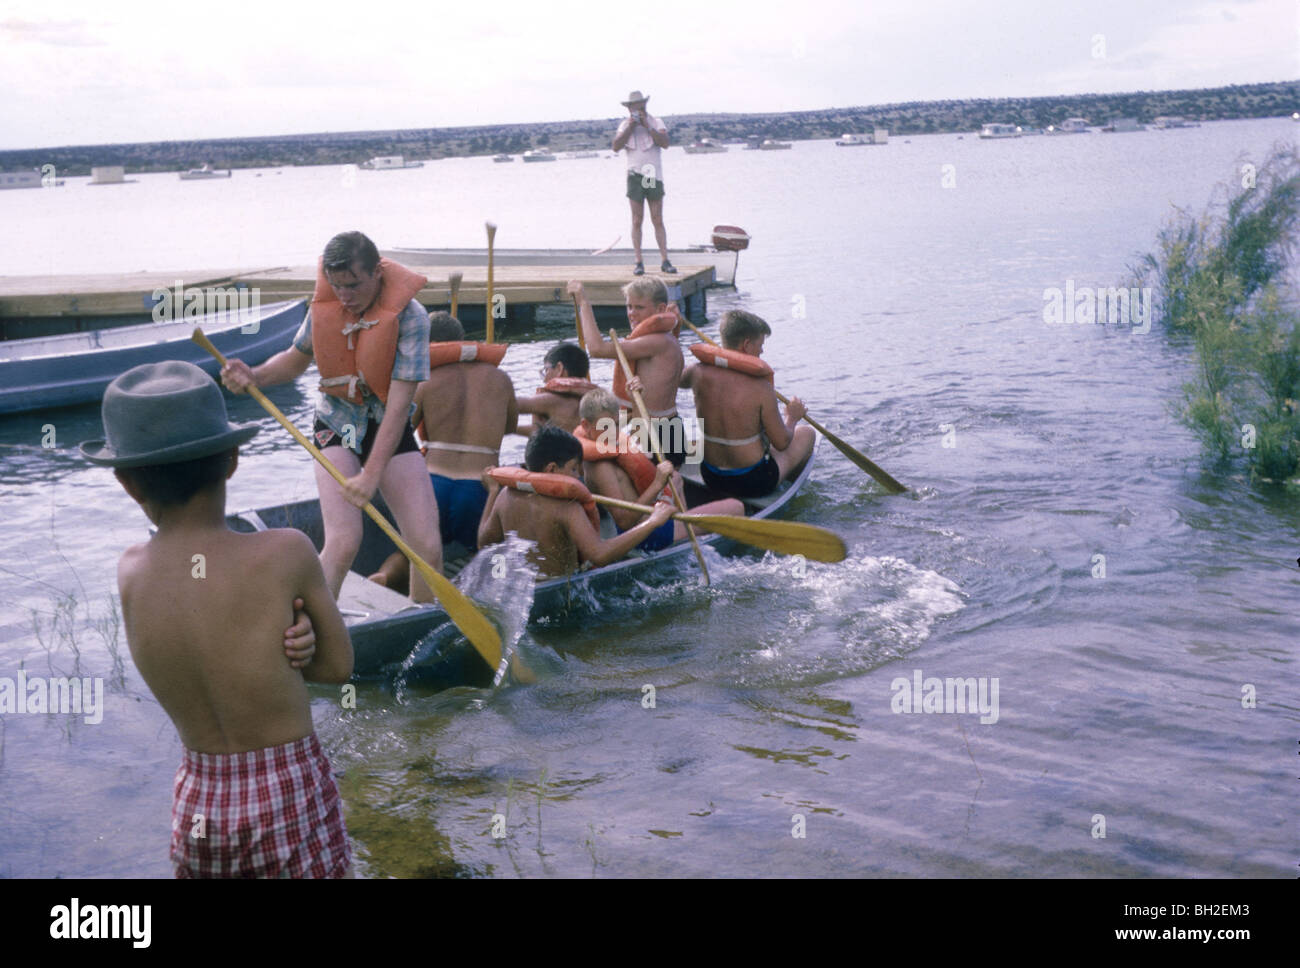 Disneyland vacation Kodachromes from 1962. childhood nostalgia boyscouts canoe canoeing merit badge sandia reservation - Stock Image